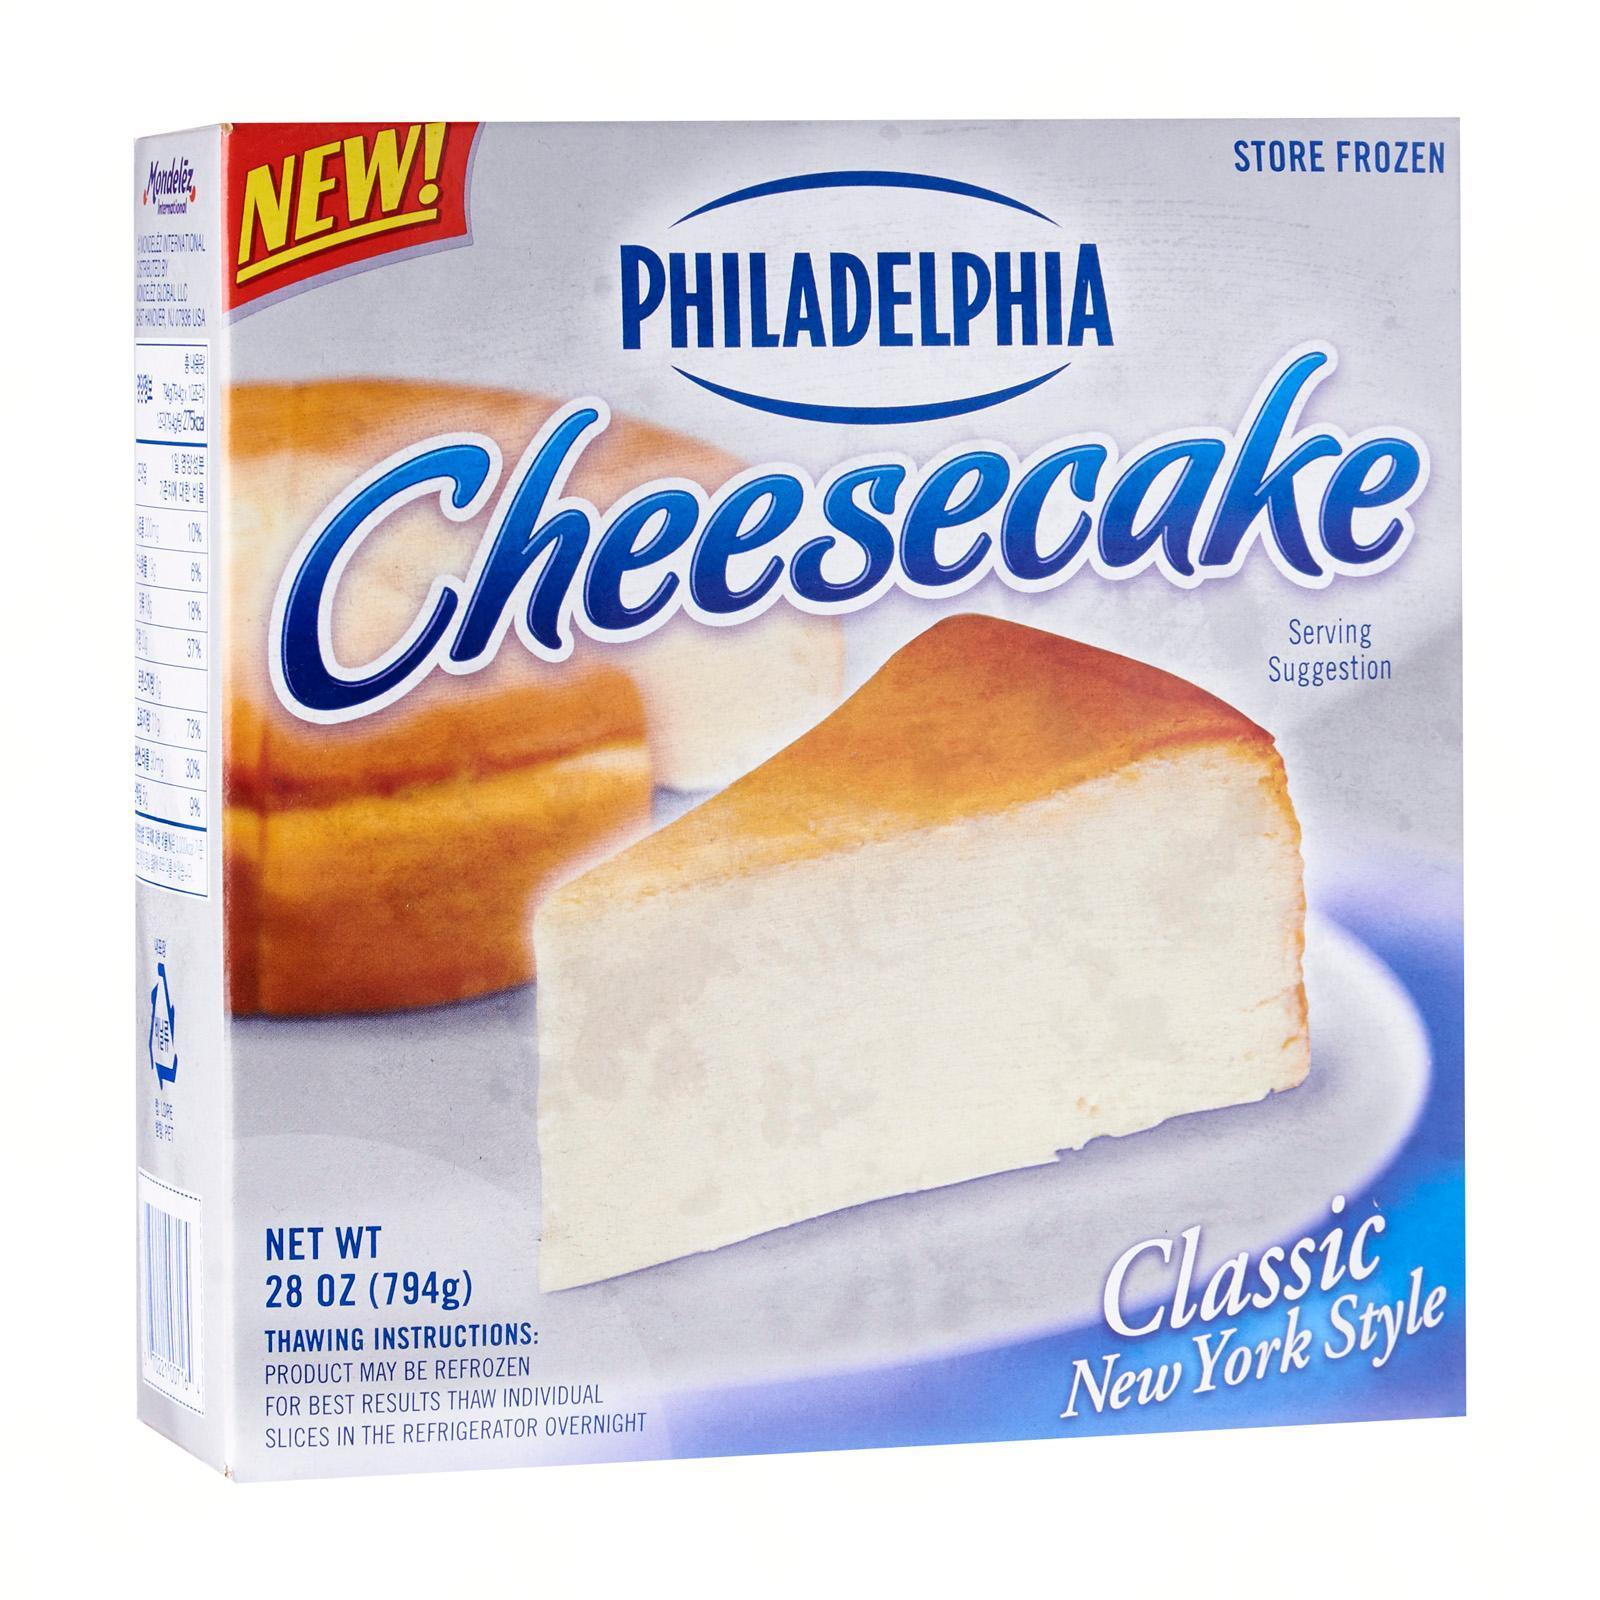 Philadelphia Cheesecake - Frozen